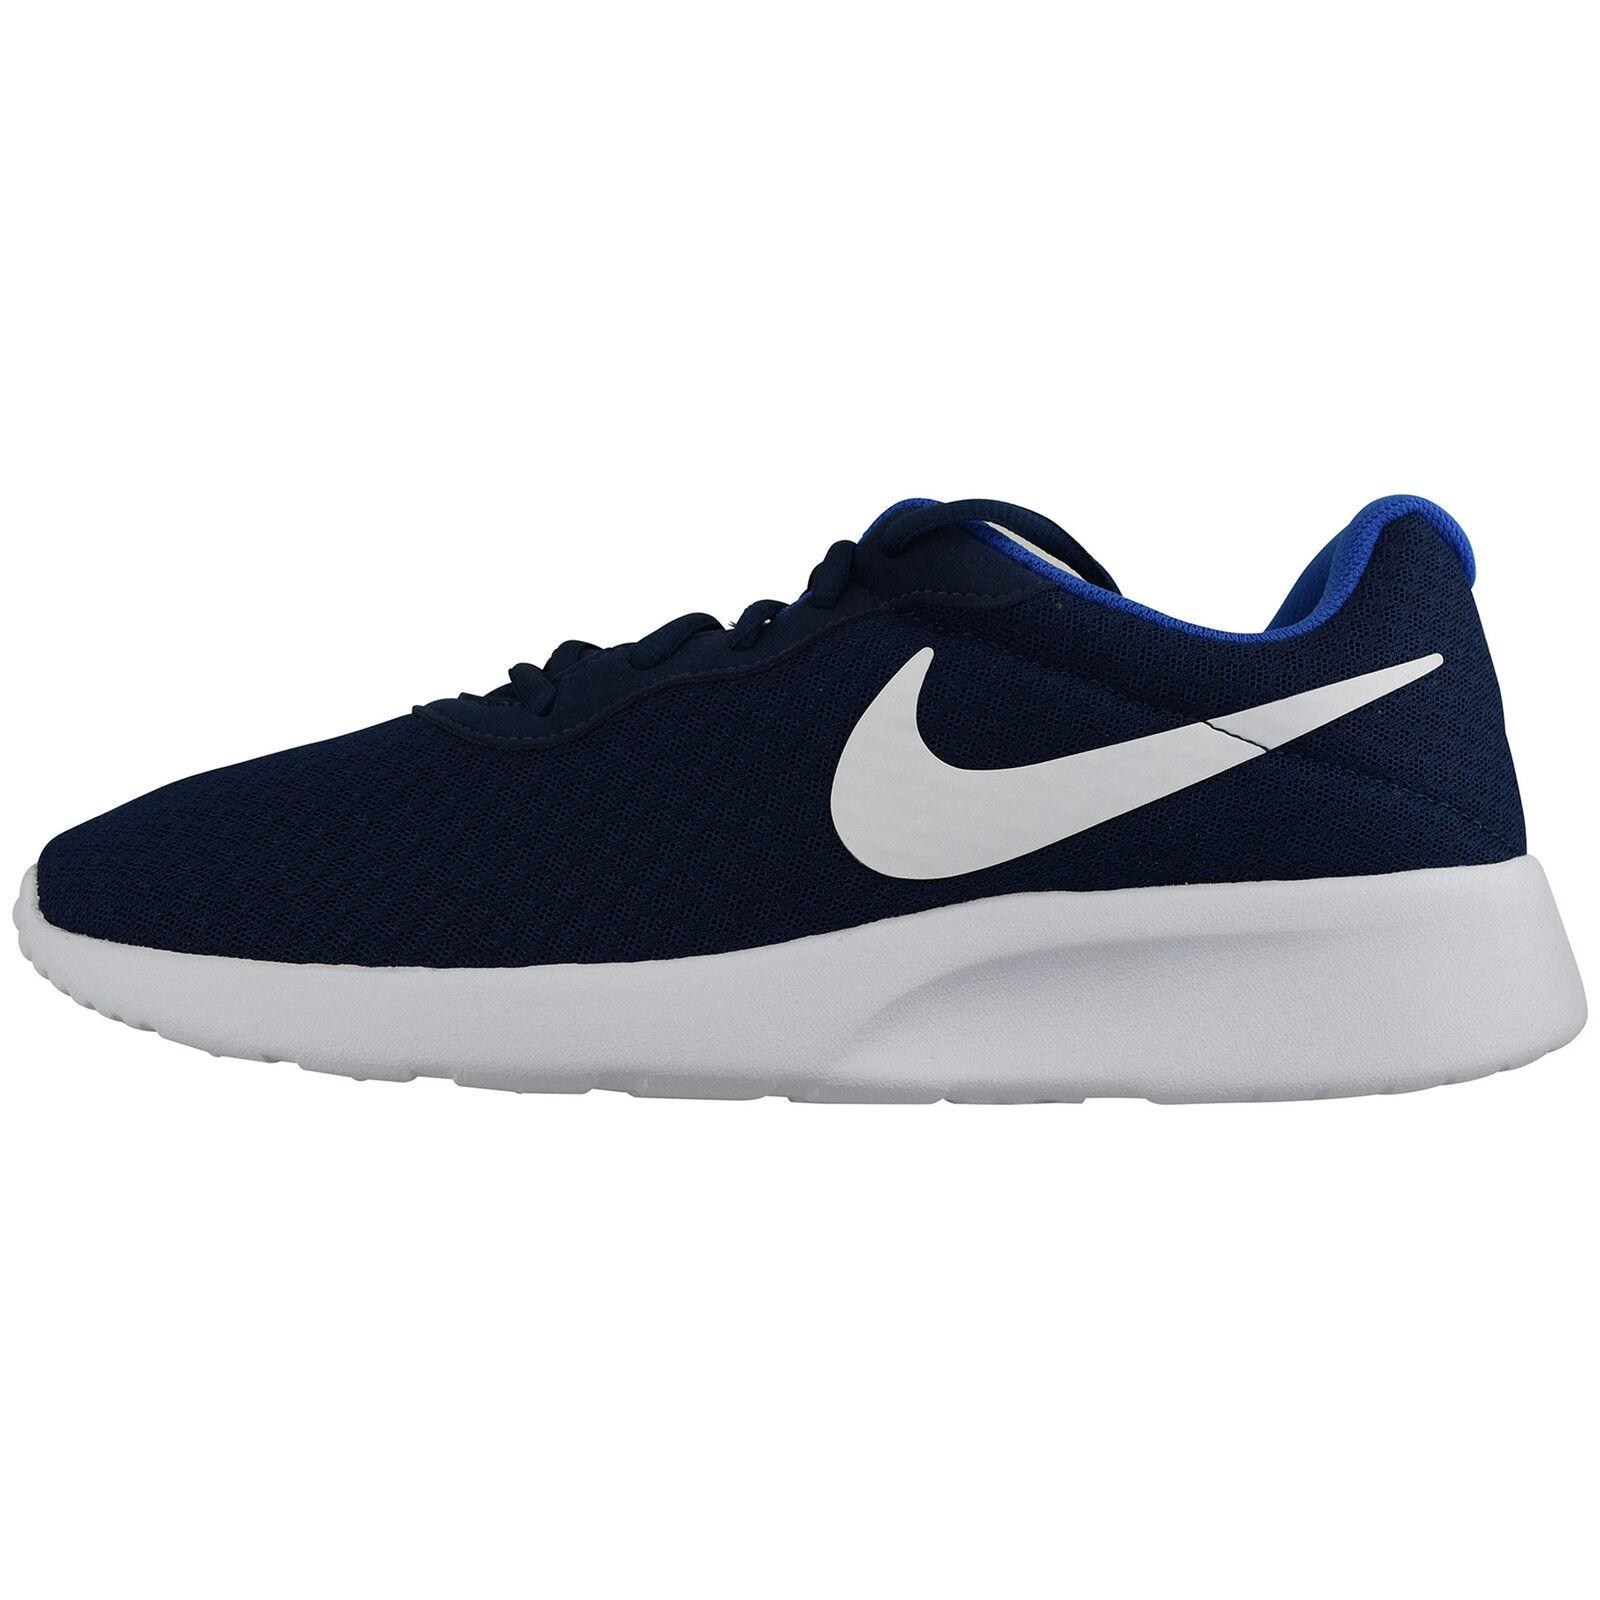 812654 Tanjun Course De Baskets Lifestyle Loisirs Nike 414 AOaqn5